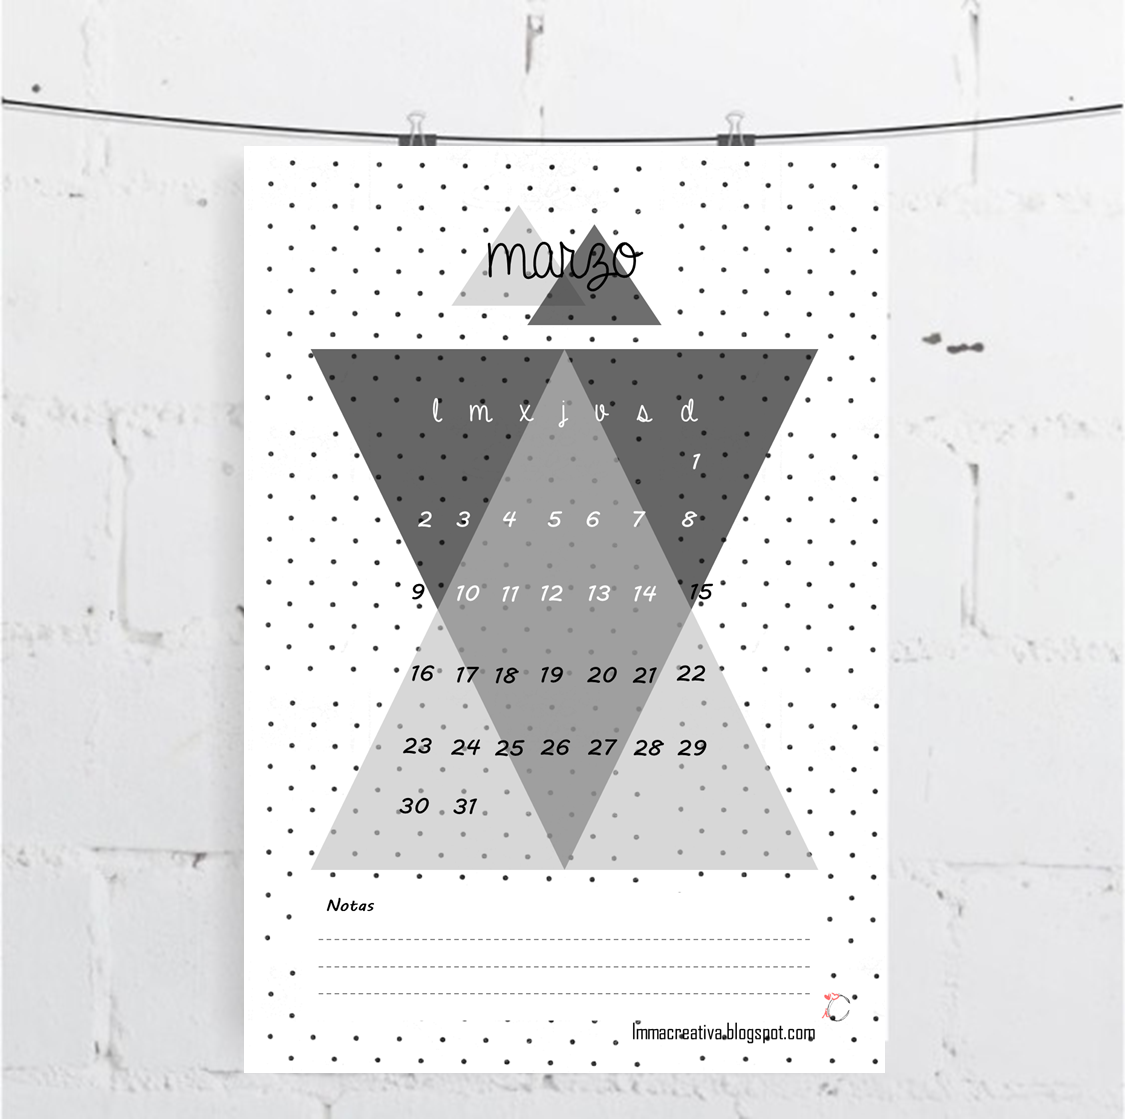 Calendarios-Marzo-ImmaCreativa